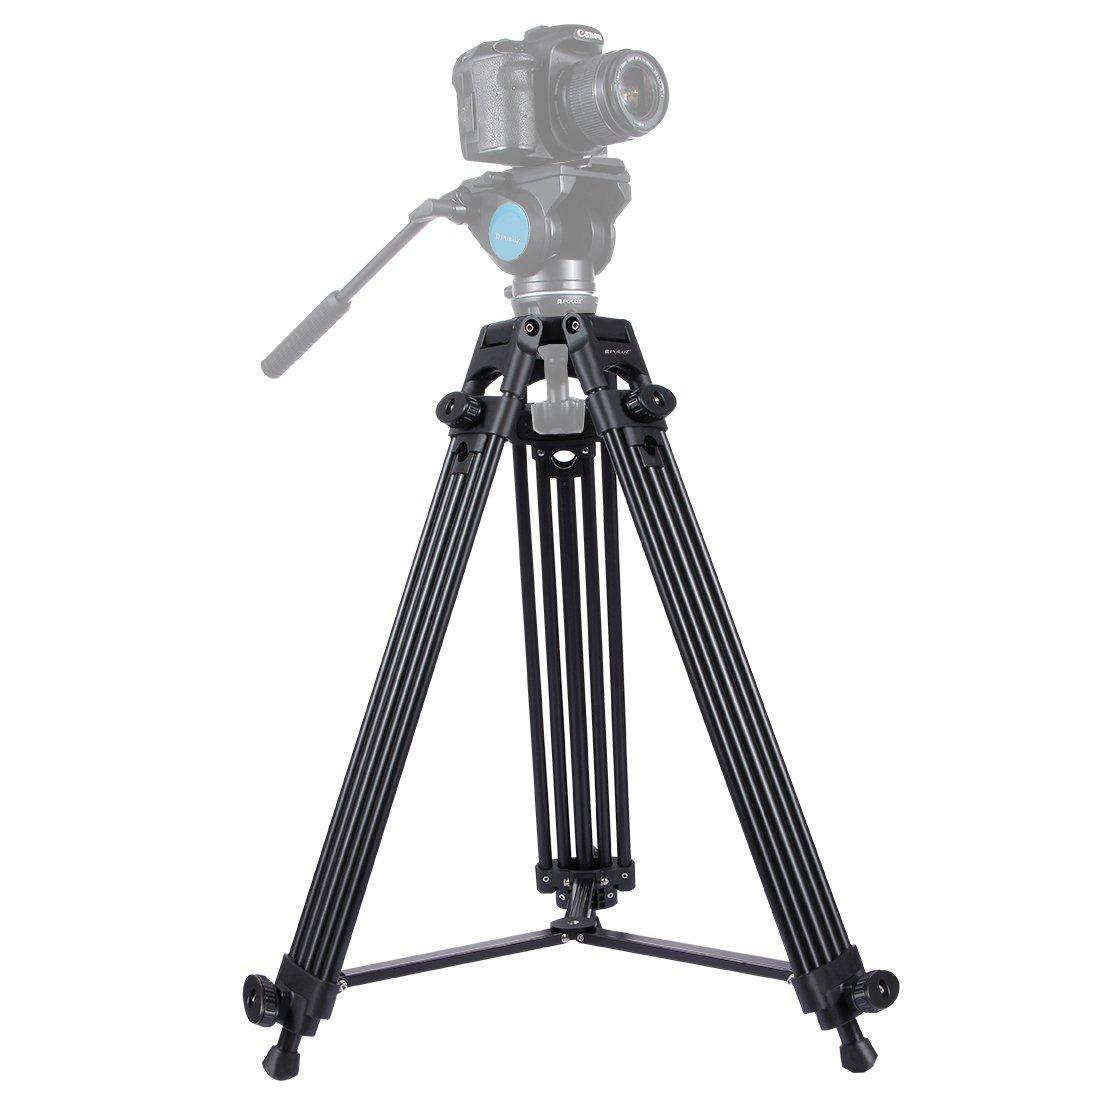 Camera Tripod, PULUZ Professional Universal Heavy Duty Adjustable Aluminum Alloy Tripod Legs for Canon Nikon Sony Samsung DSLR Digital Cameras & Camcorders, Height: 62~150cm, Max Load: 40kg/88lb